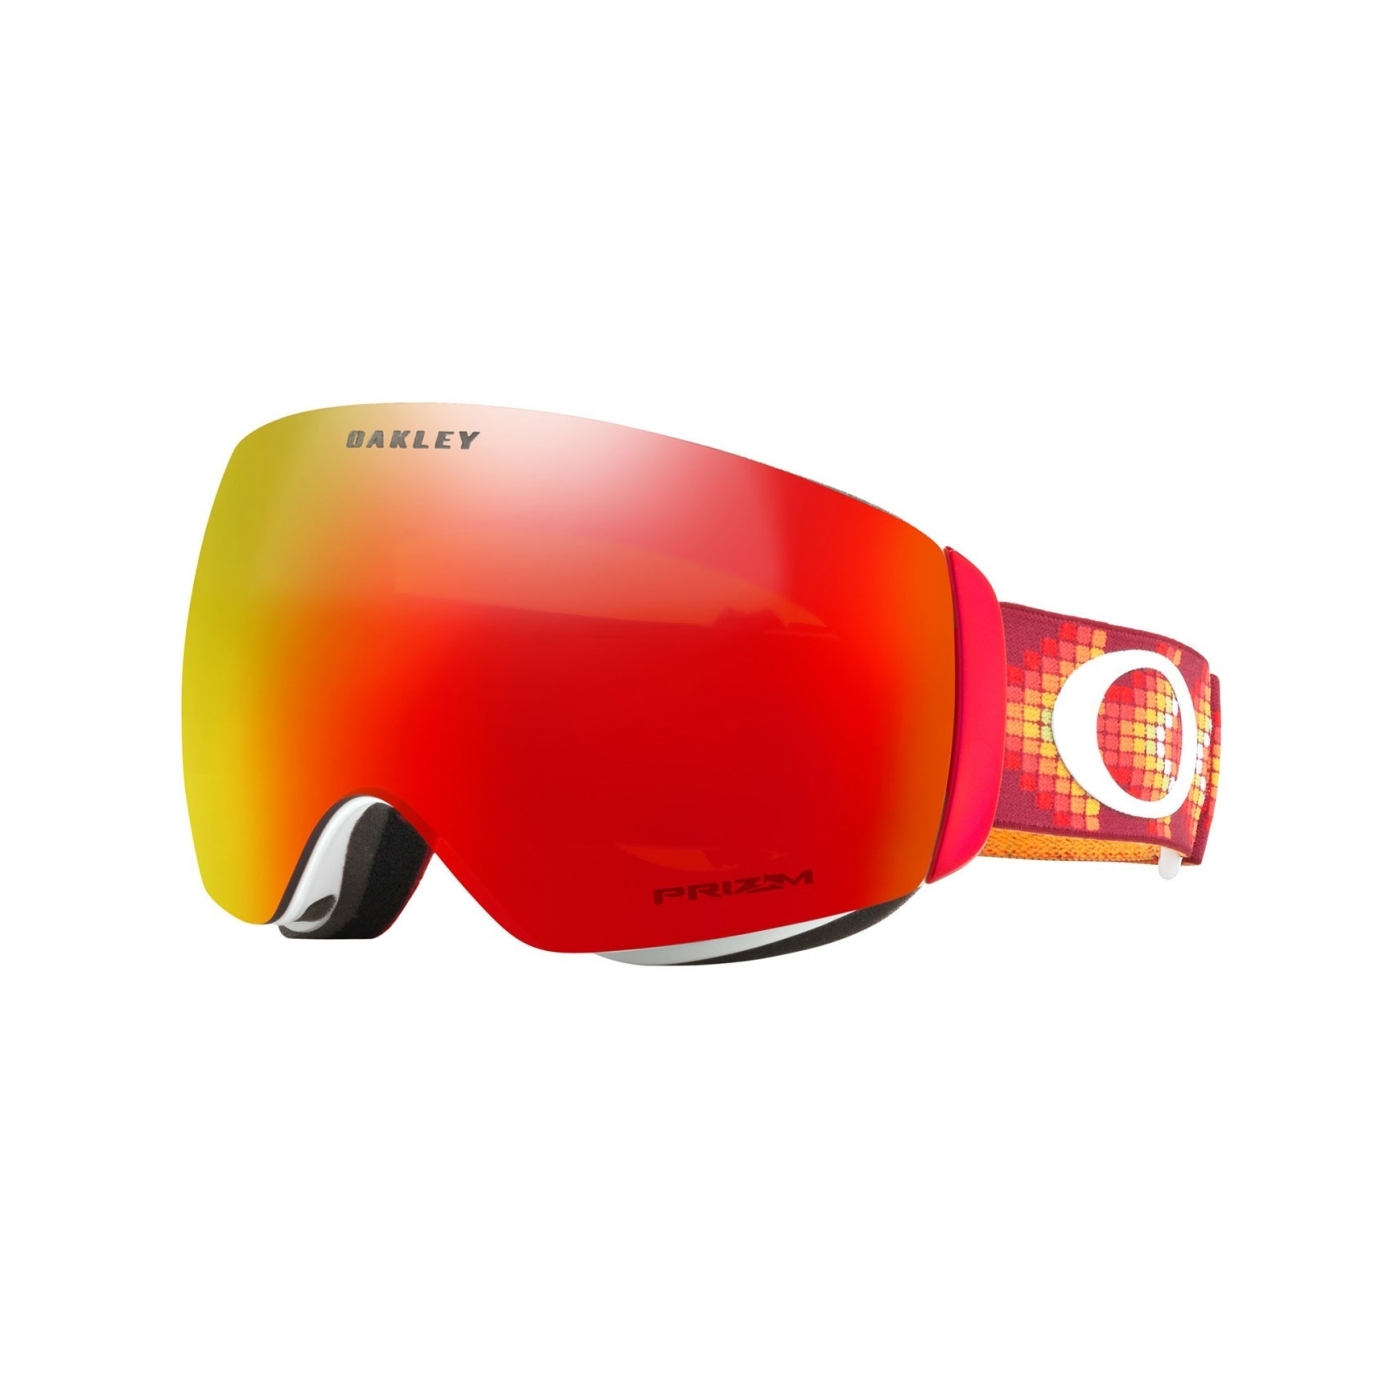 429b2eccb6249 Masque Ski Oakley Flight Deck Xm Red Prizm Torch